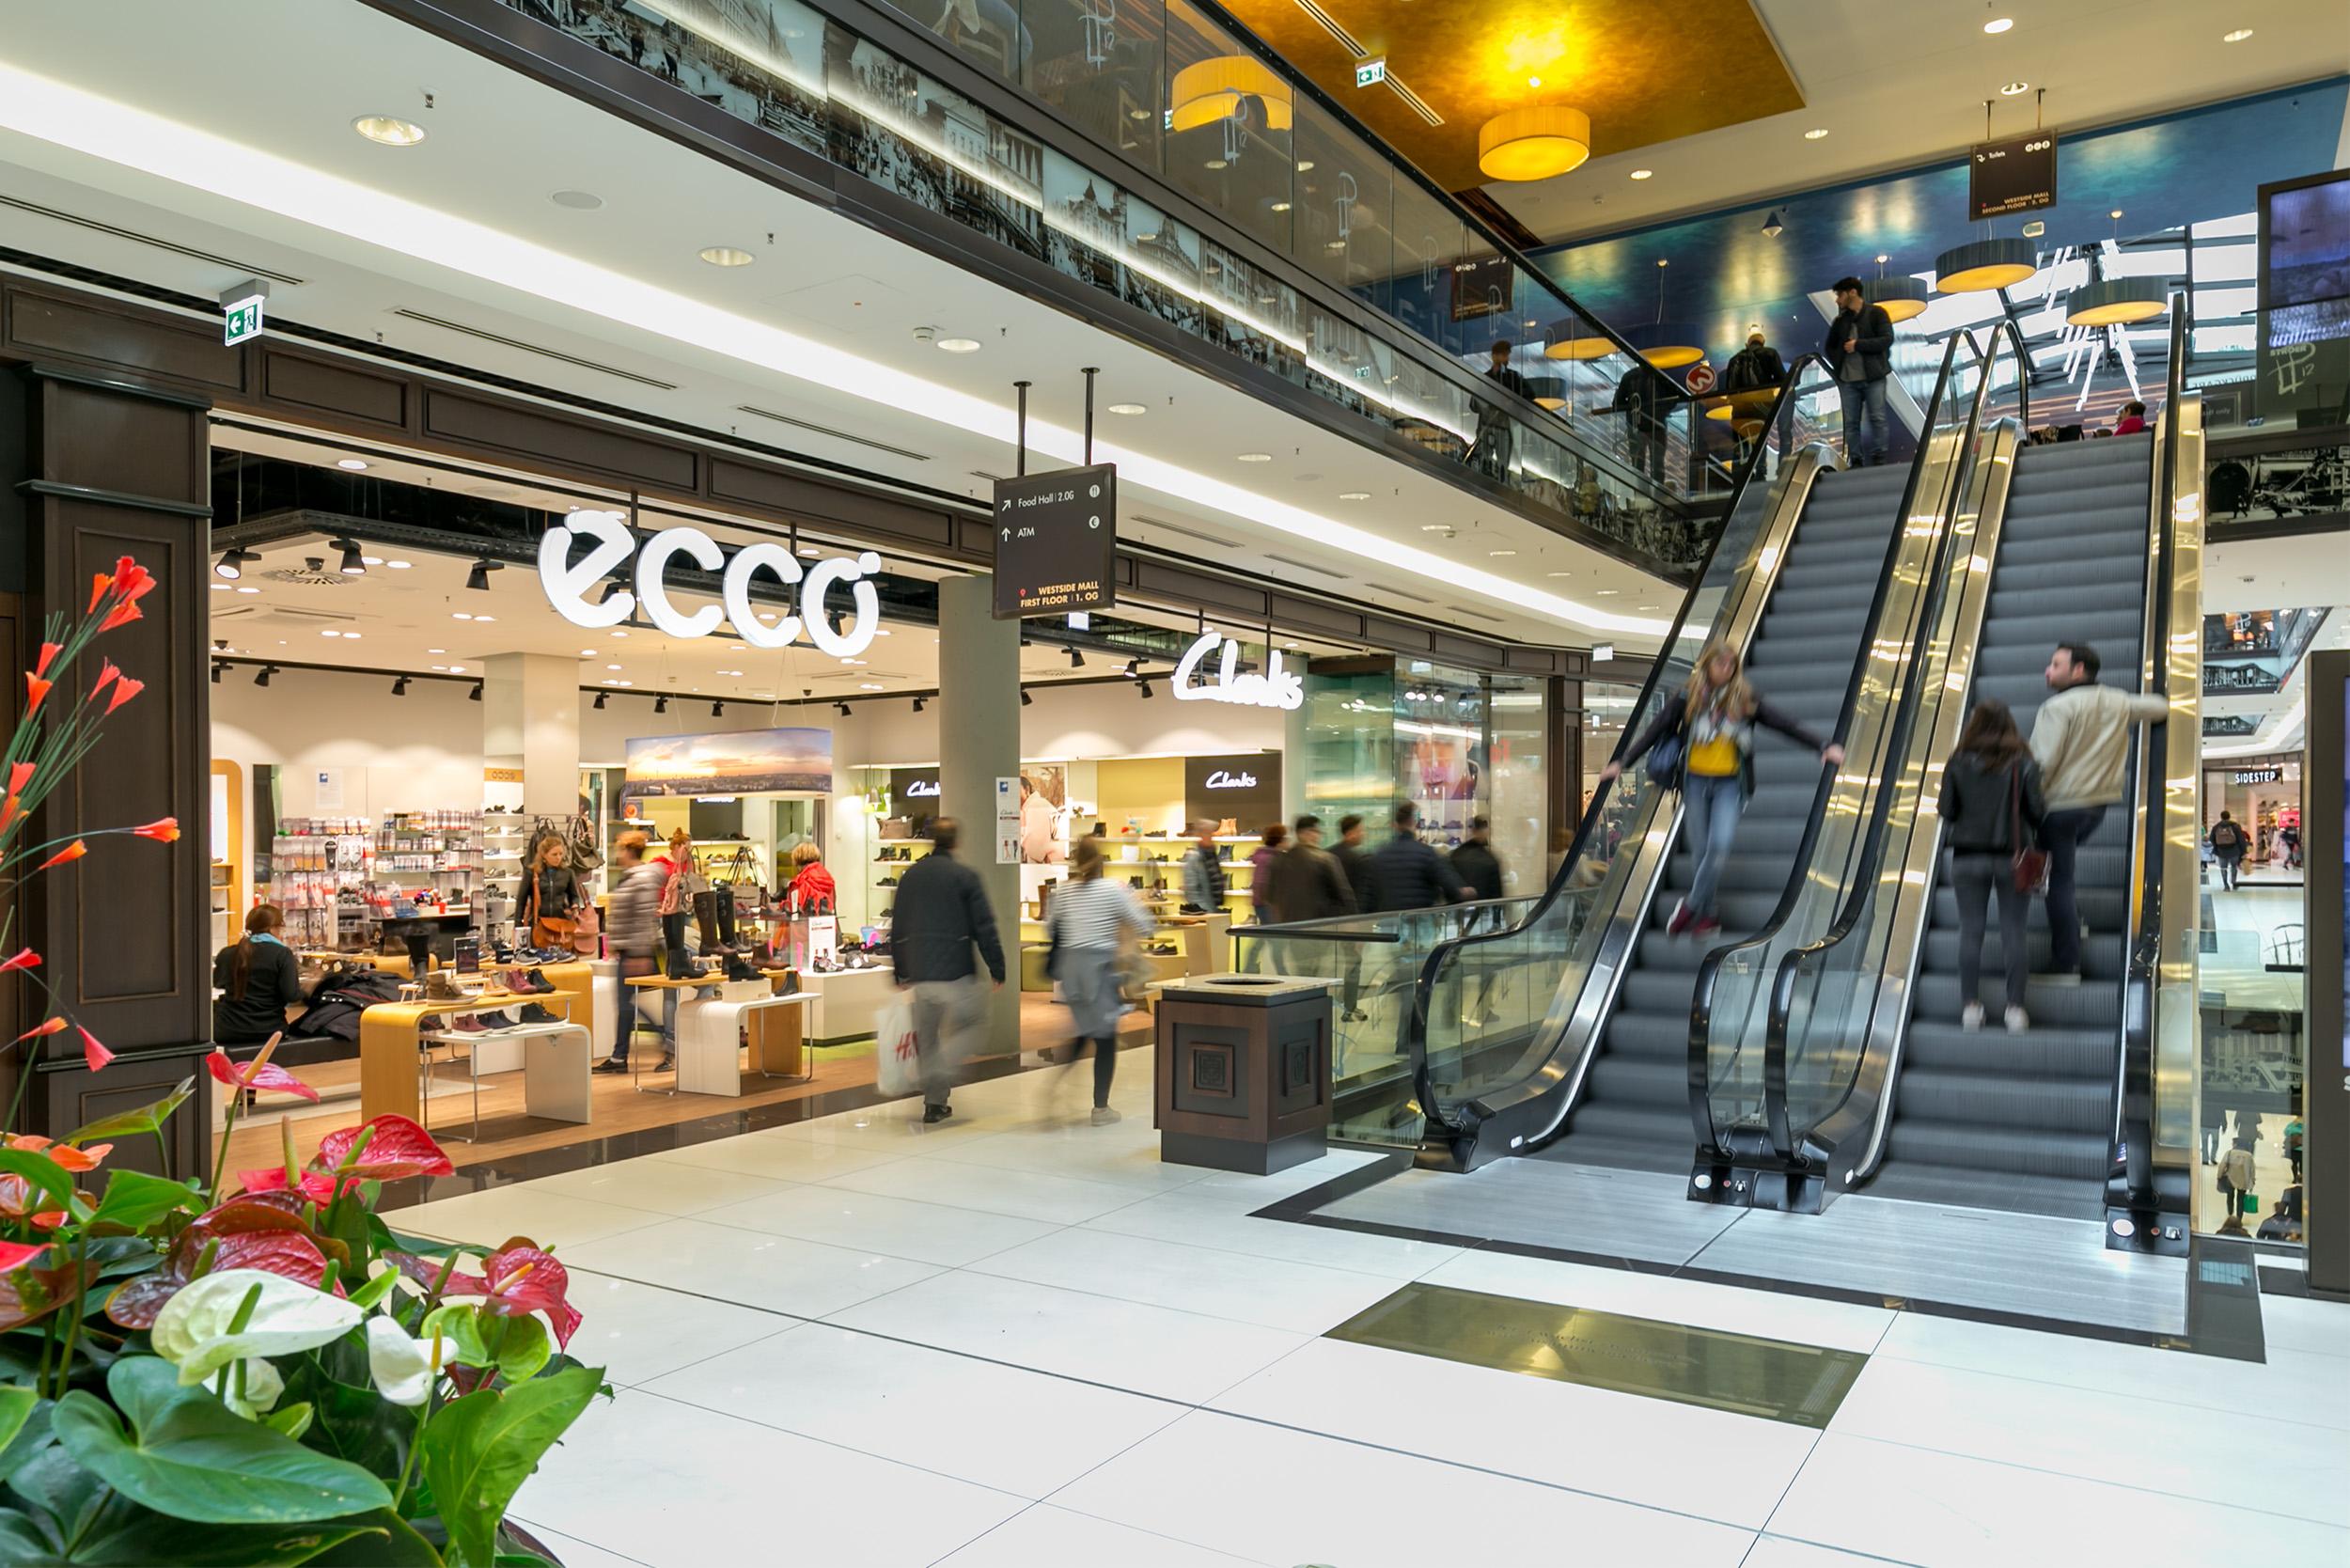 Clarks ECCO Mall of Berlin